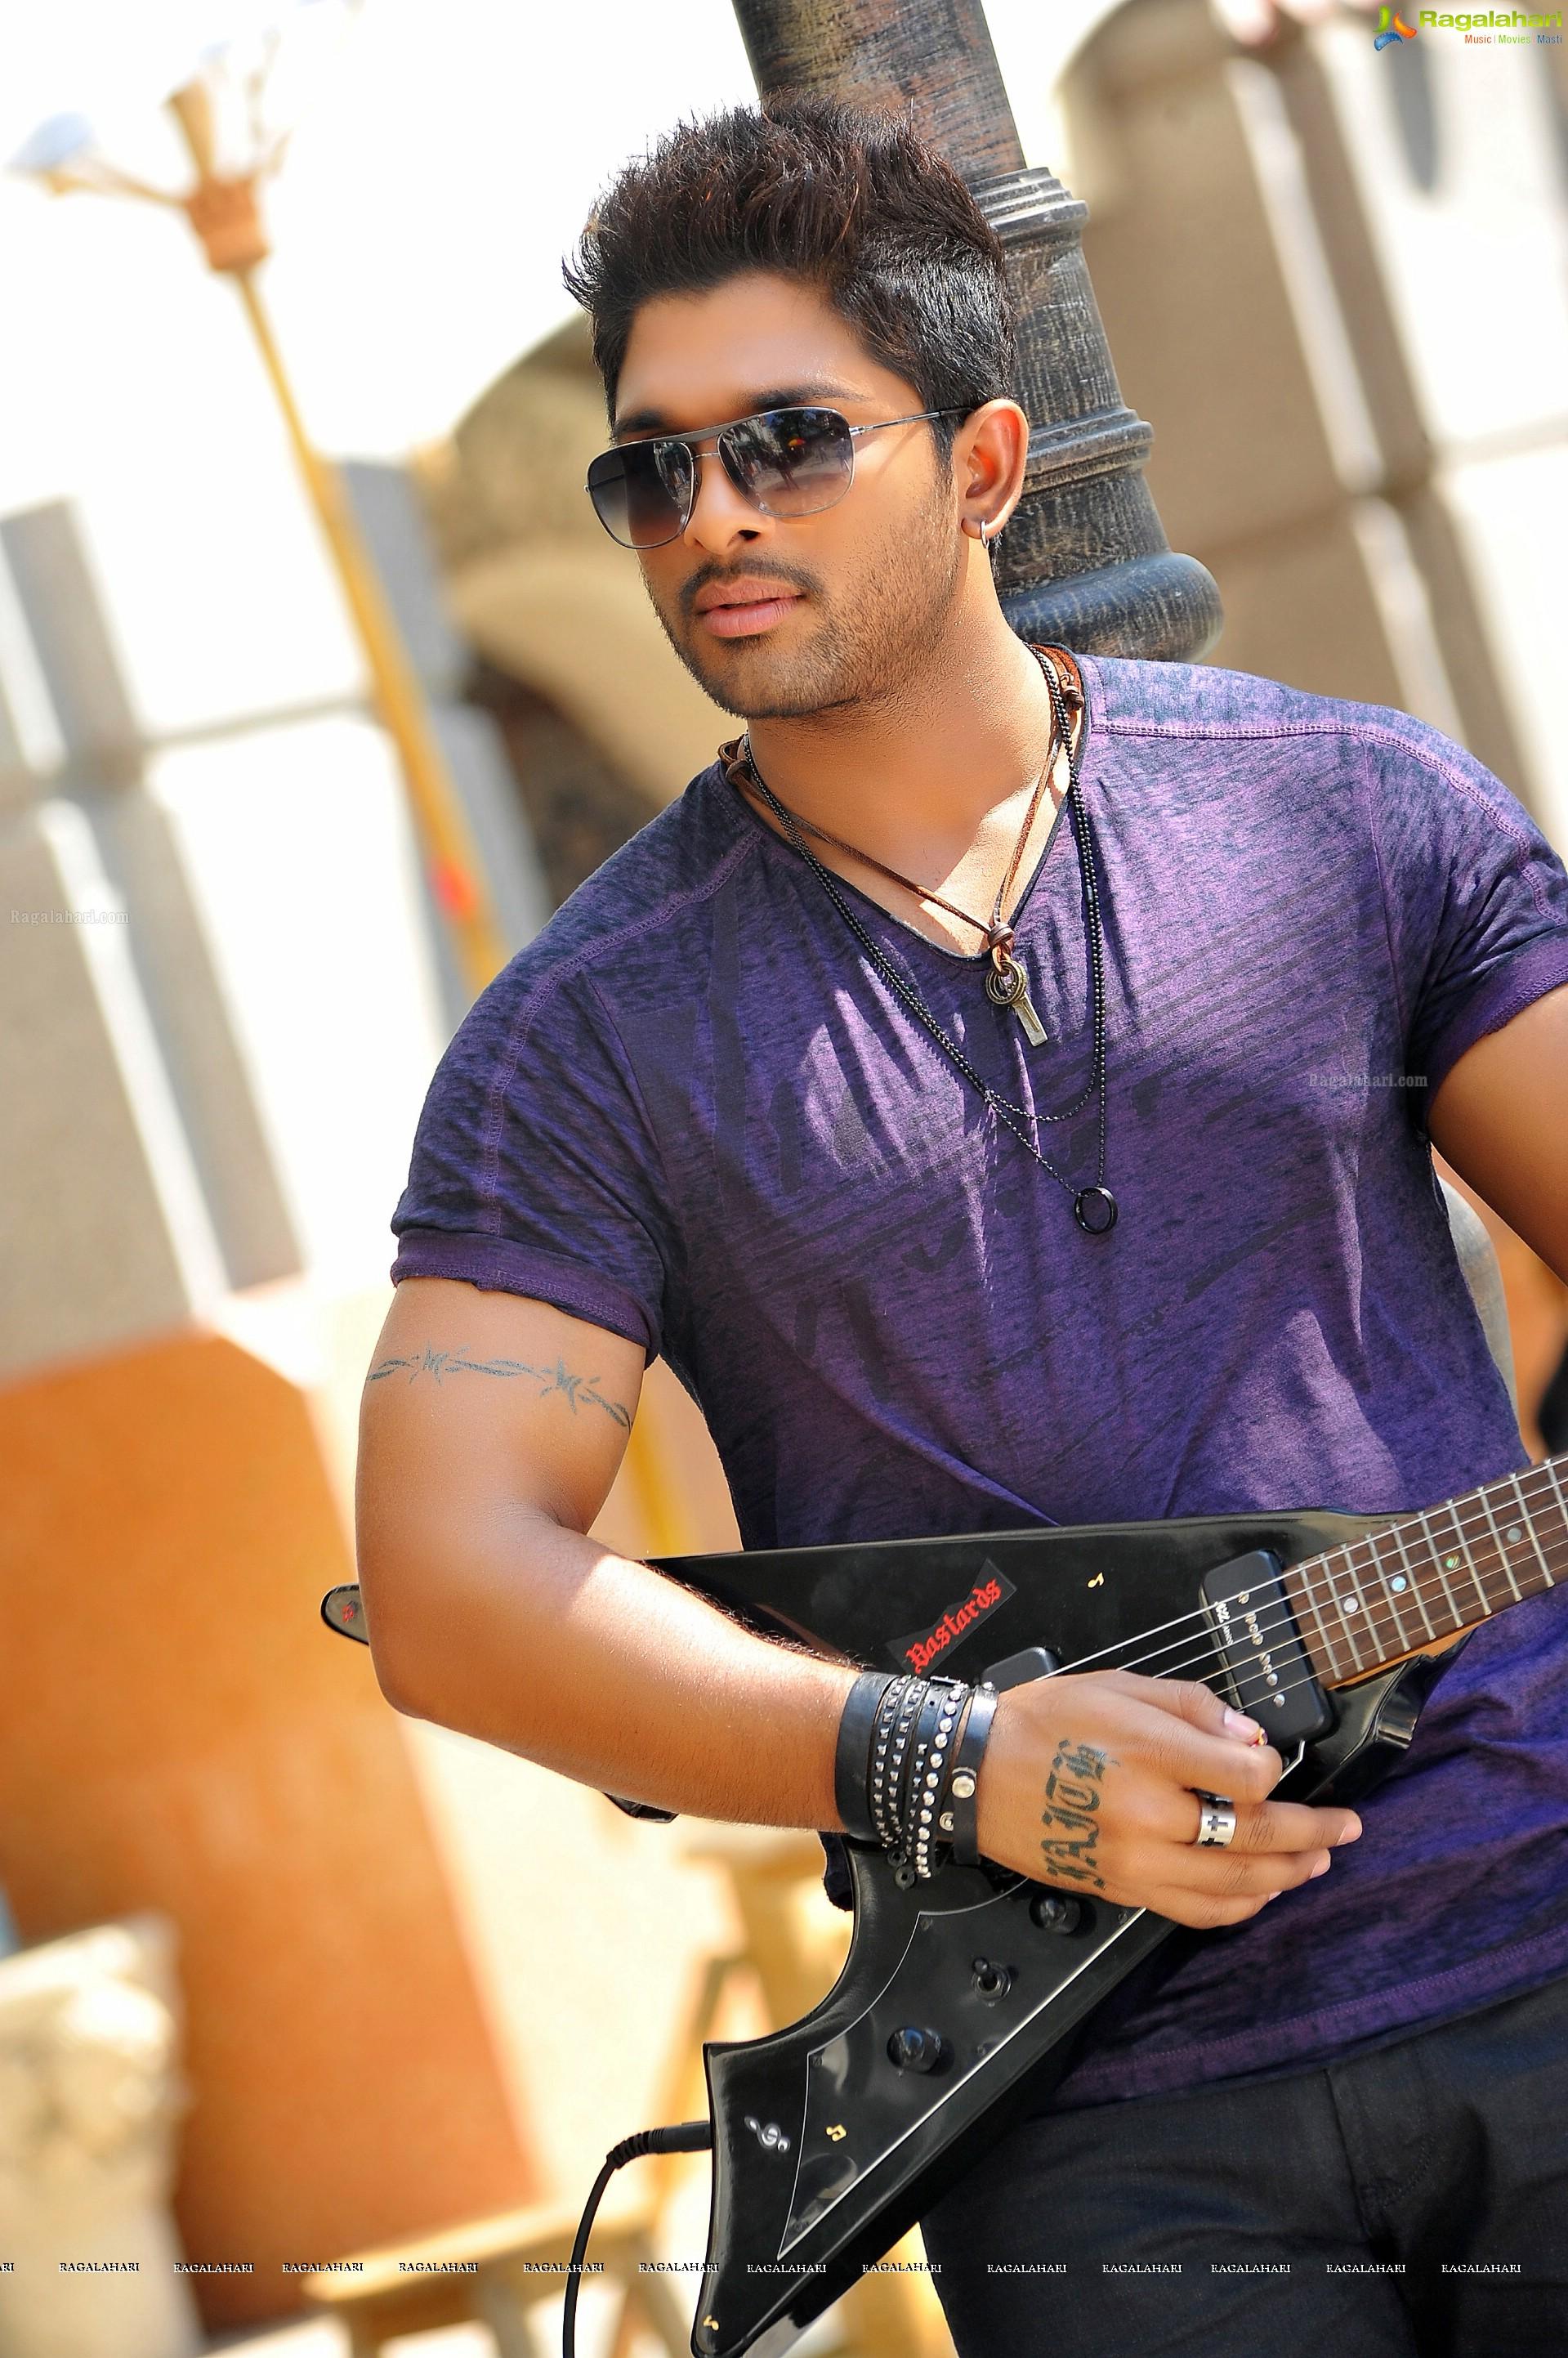 Allu Arjun Hd Image 3 Telugu Cinema Hero Photos Galleryimages